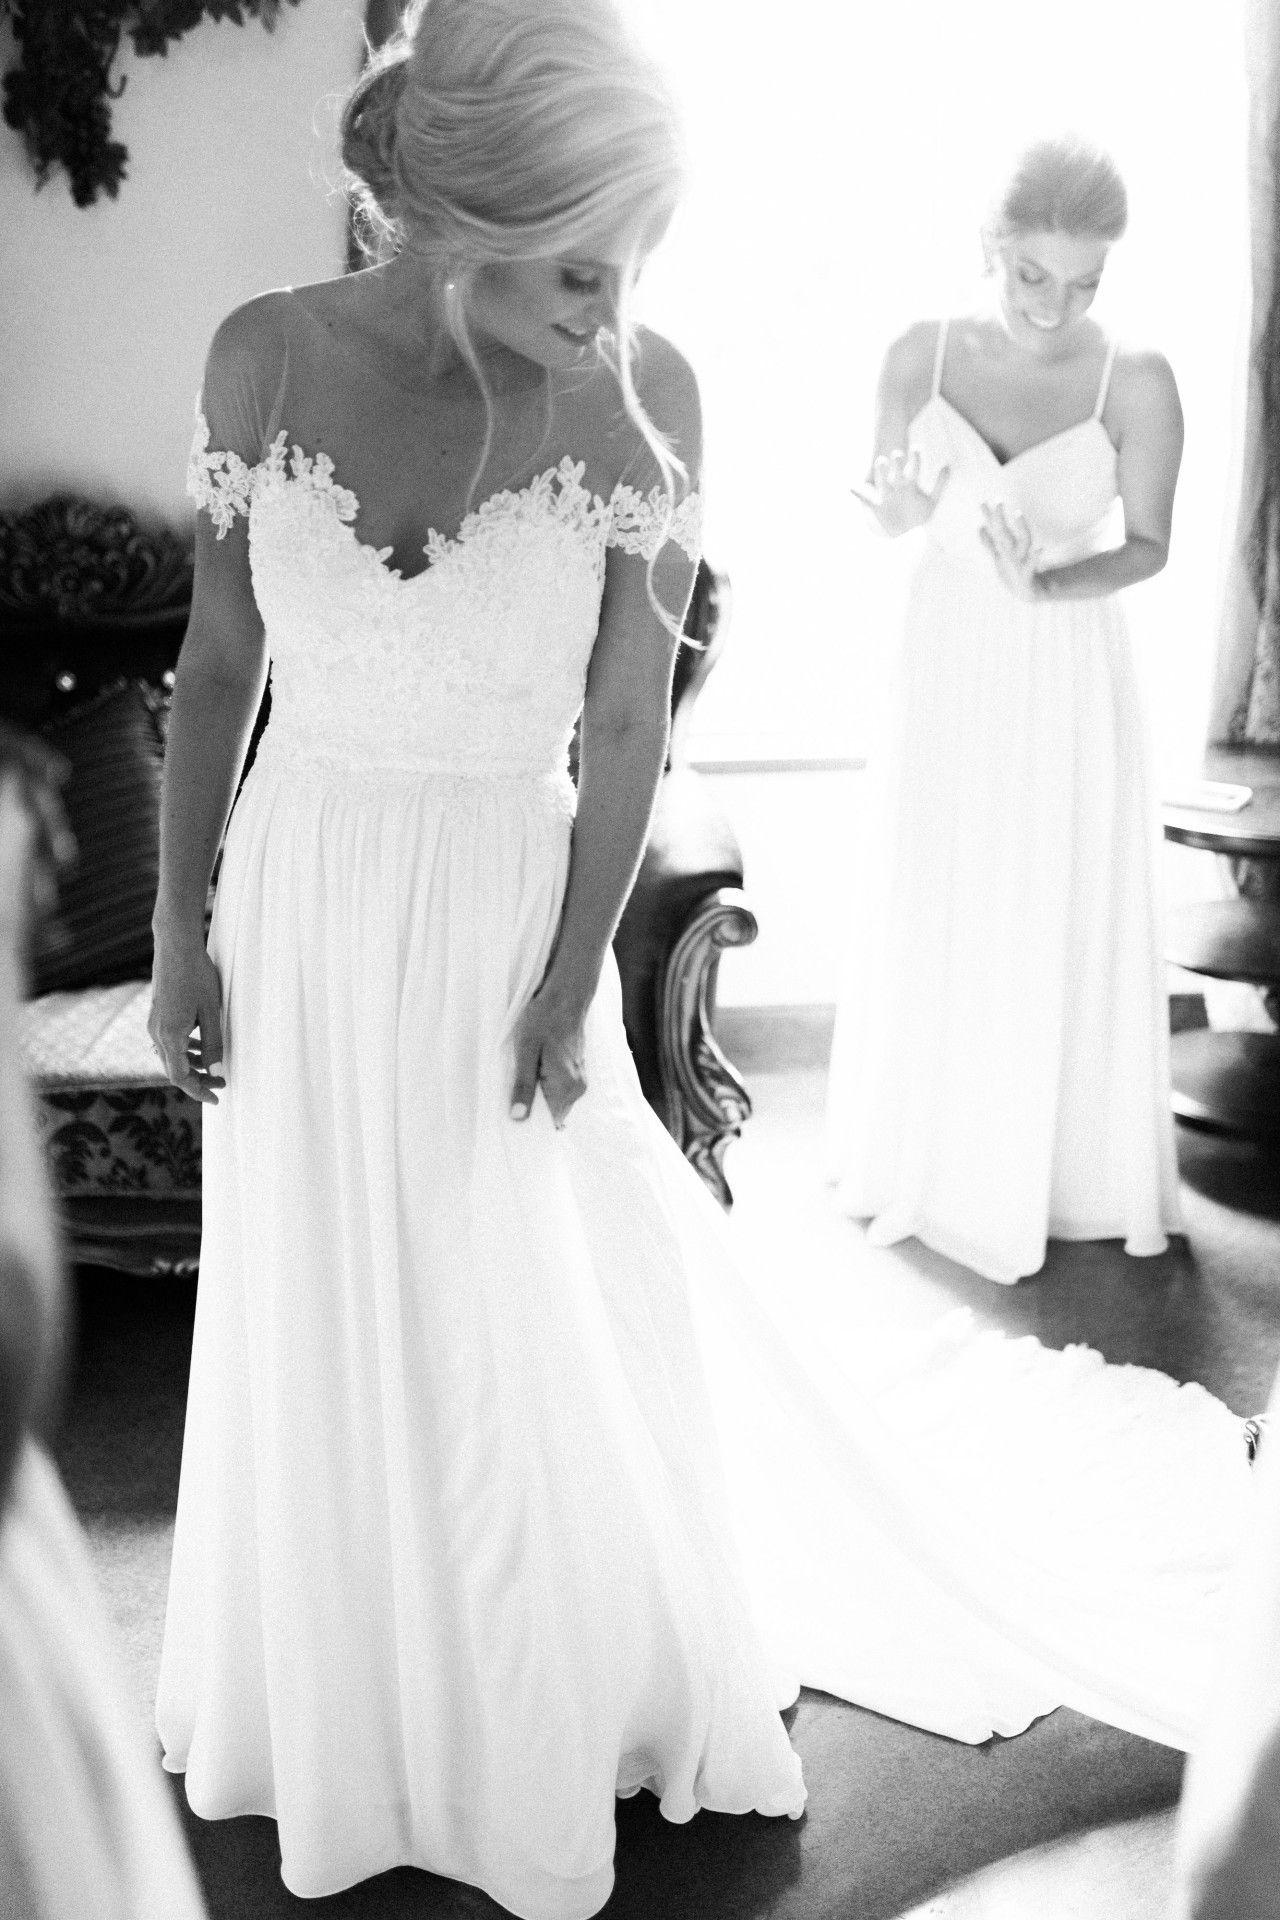 Bohemian wedding dress bohoflow wedding dress flowing bohemian